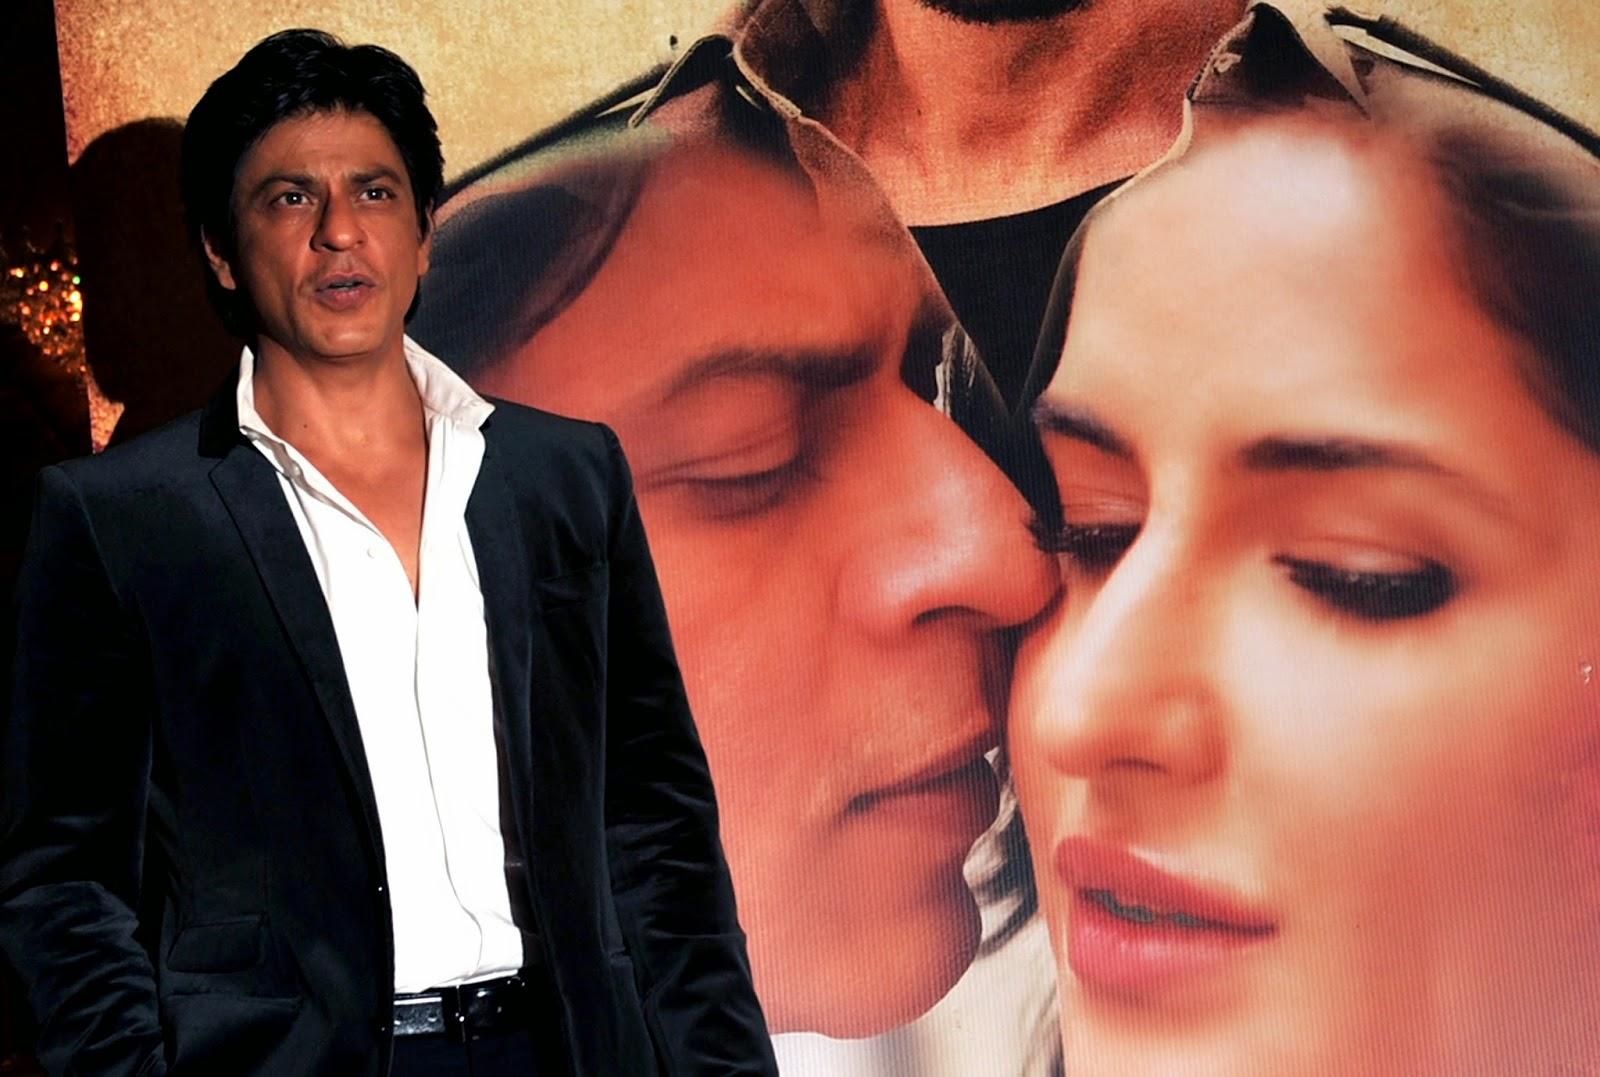 Actress, Bollywood, Bollywood actress, Entertainment, Film, Jab Tak Hai Jaan, Katrina Kaif, Katrina Kaif and Shahrukh Khan, Movies, Raees, Shahrukh Khan, Showbiz, King Khan,